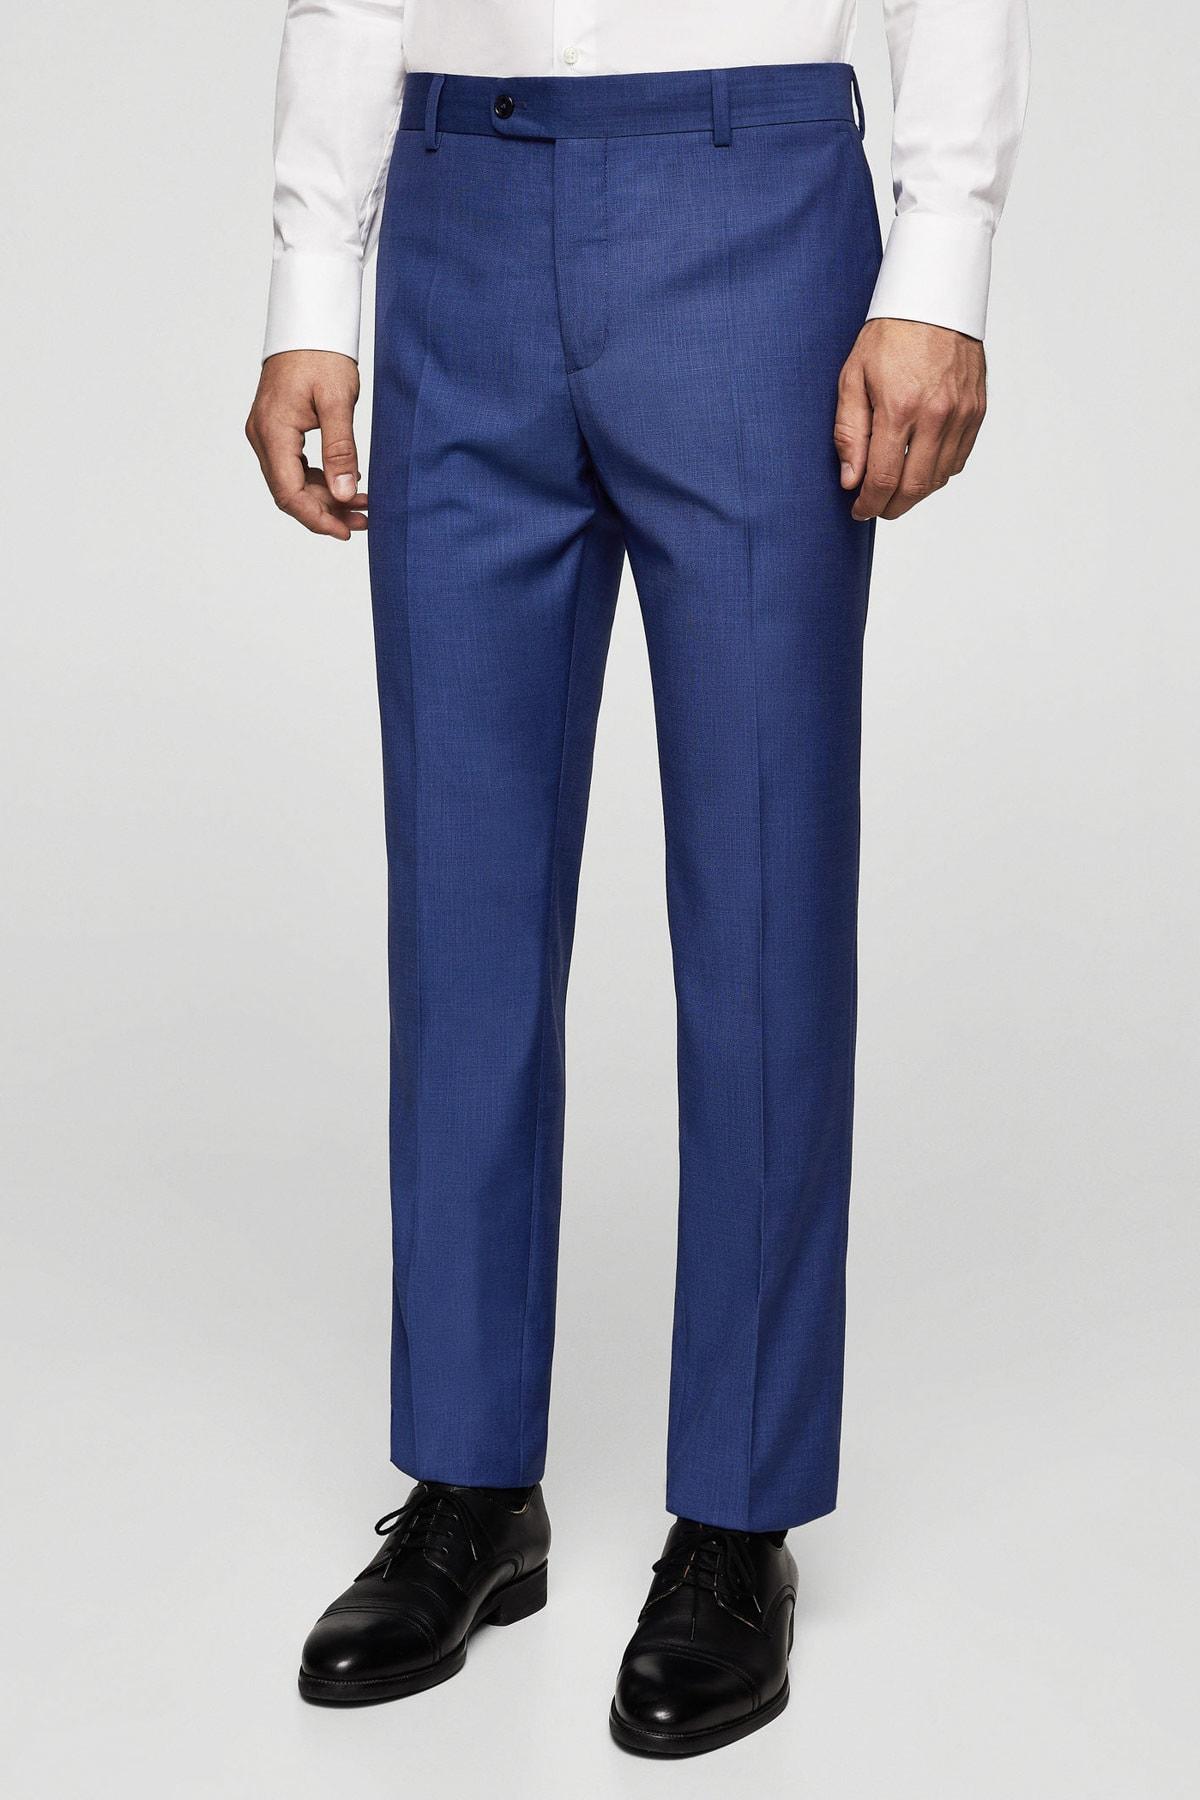 MANGO Man Erkek Prusya Mavisi Pantolon 23030906 2